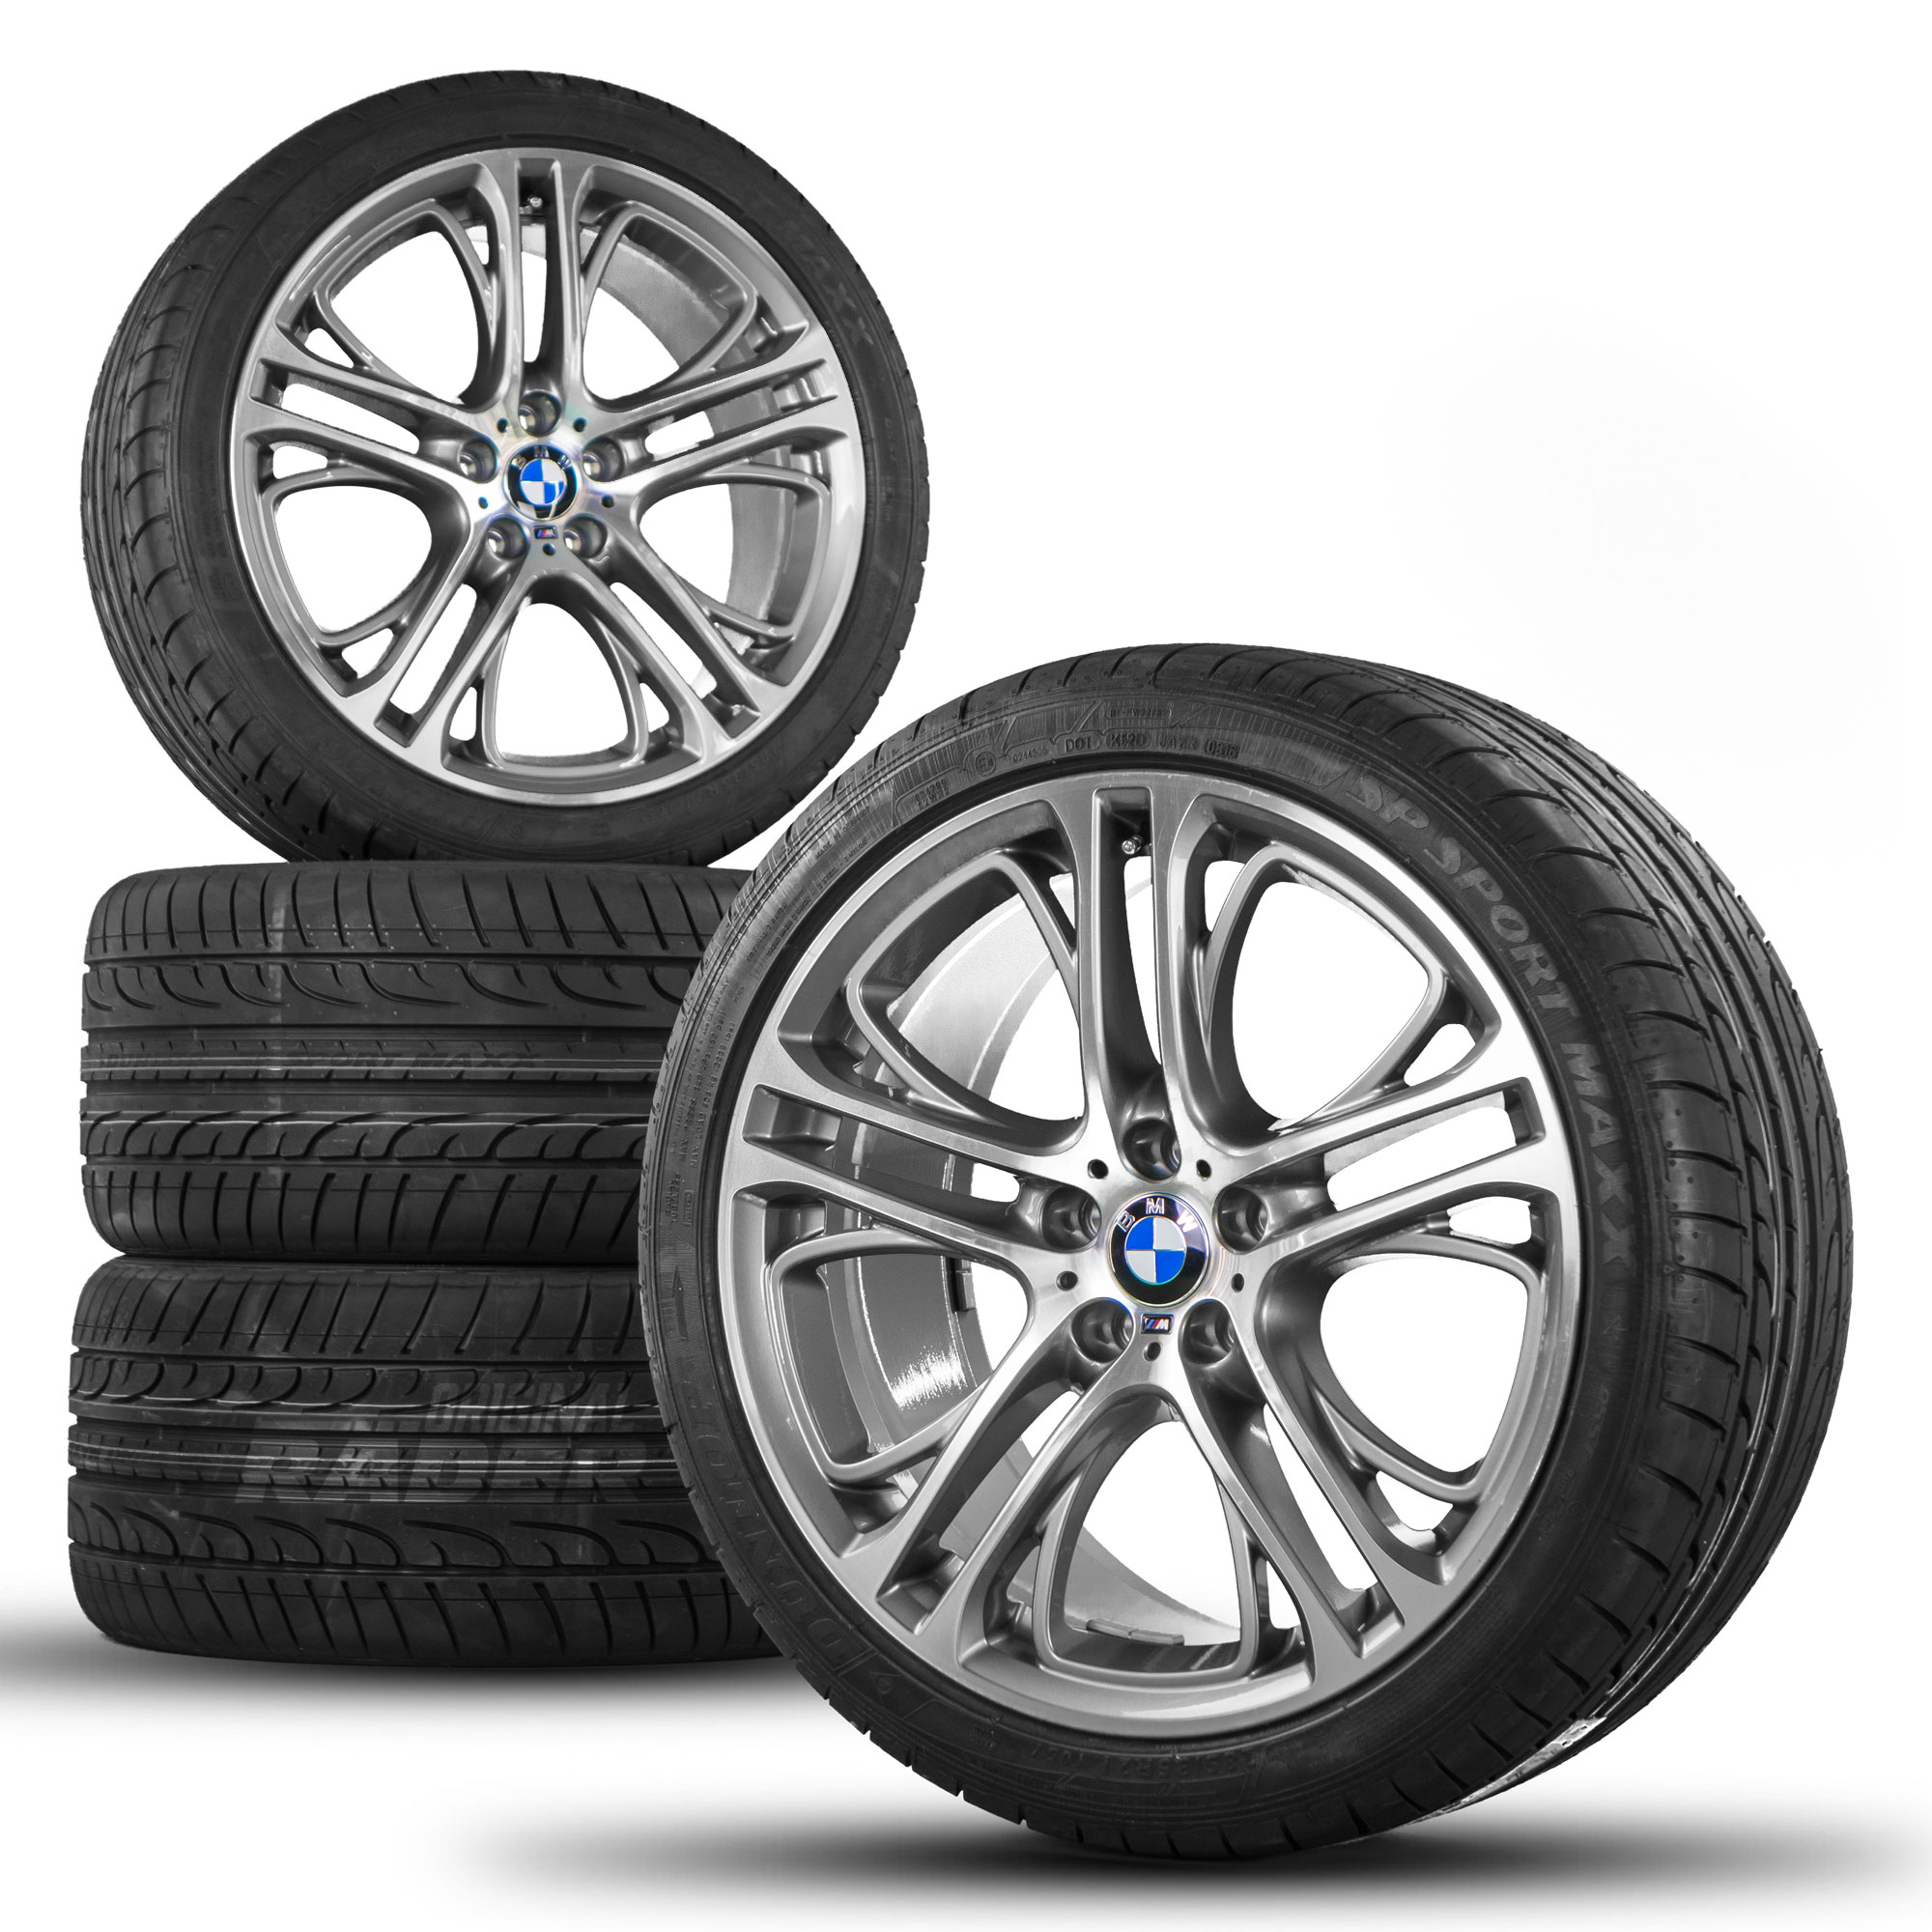 Bmw X6 Tire Pressure: BMW 21 Inch Rims X5 E70 F15 X6 E71 F16 Alloy Wheels Summer